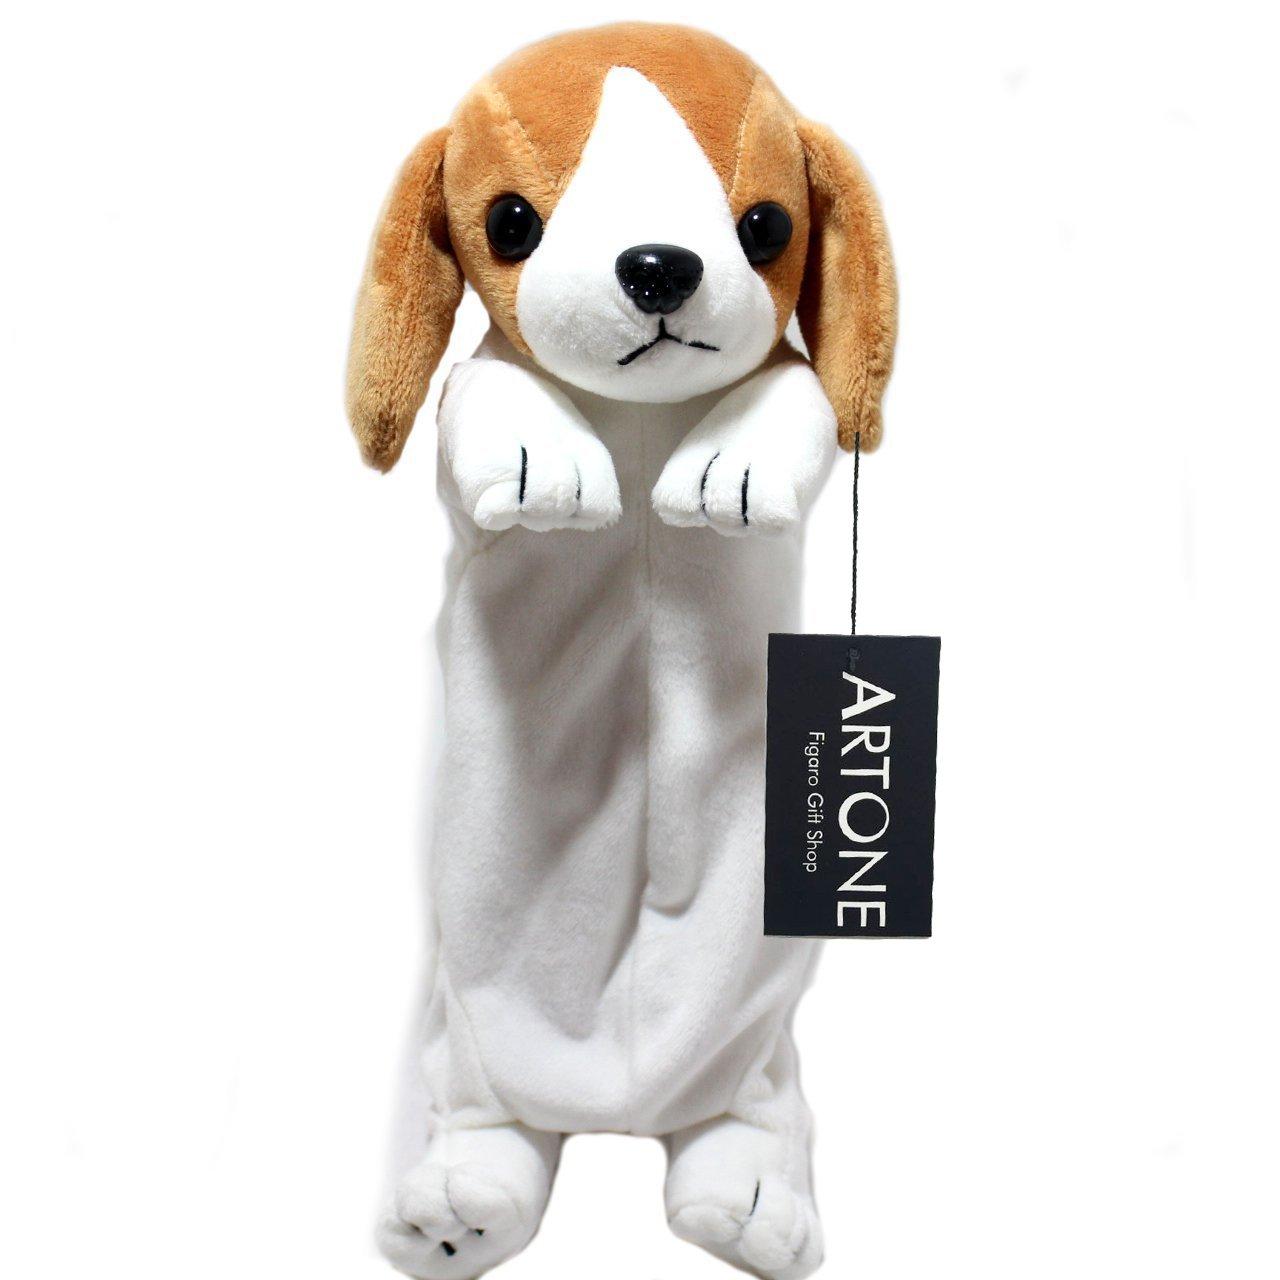 Artone Borroso Beagle Perro Lápiz Caja De La Pluma Papelería Pounch Cosmético